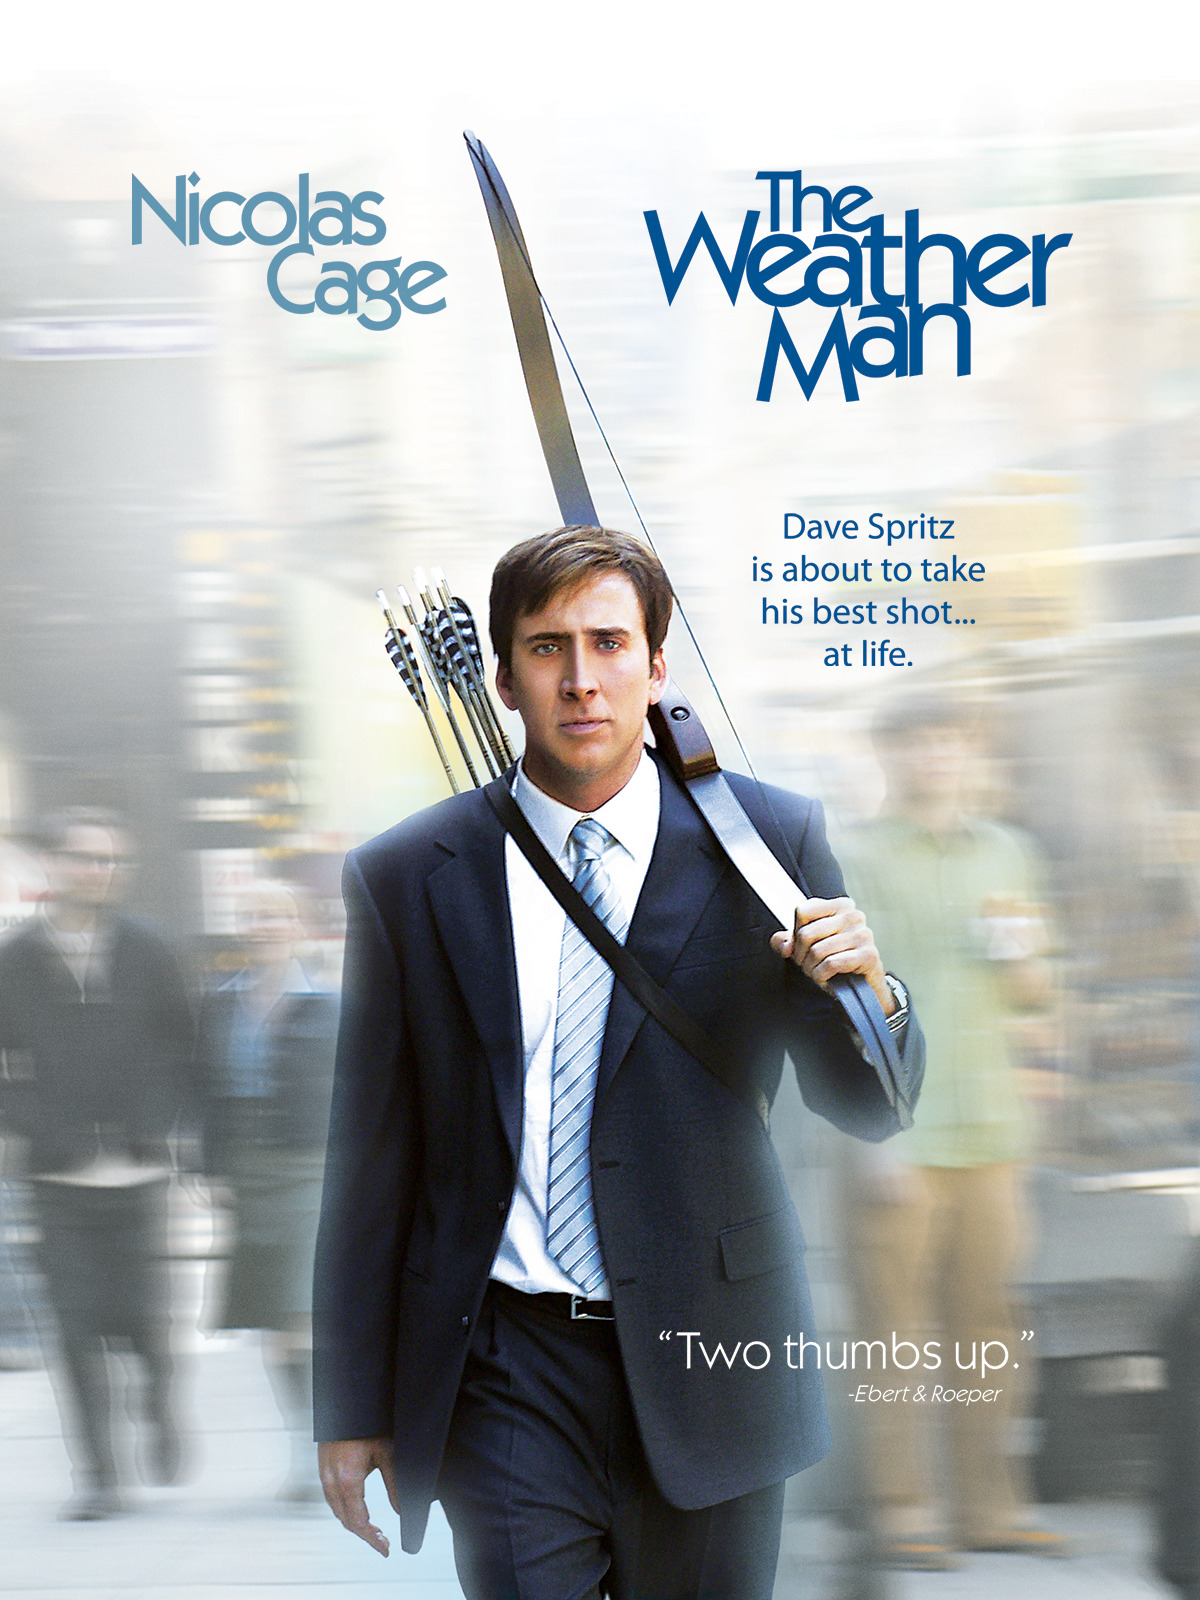 The Weather Man (2005) 720p HDRip Hollywood Movie ORG. [Dual Audio] [Hindi or English] x264 AAC ESubs [1GB]